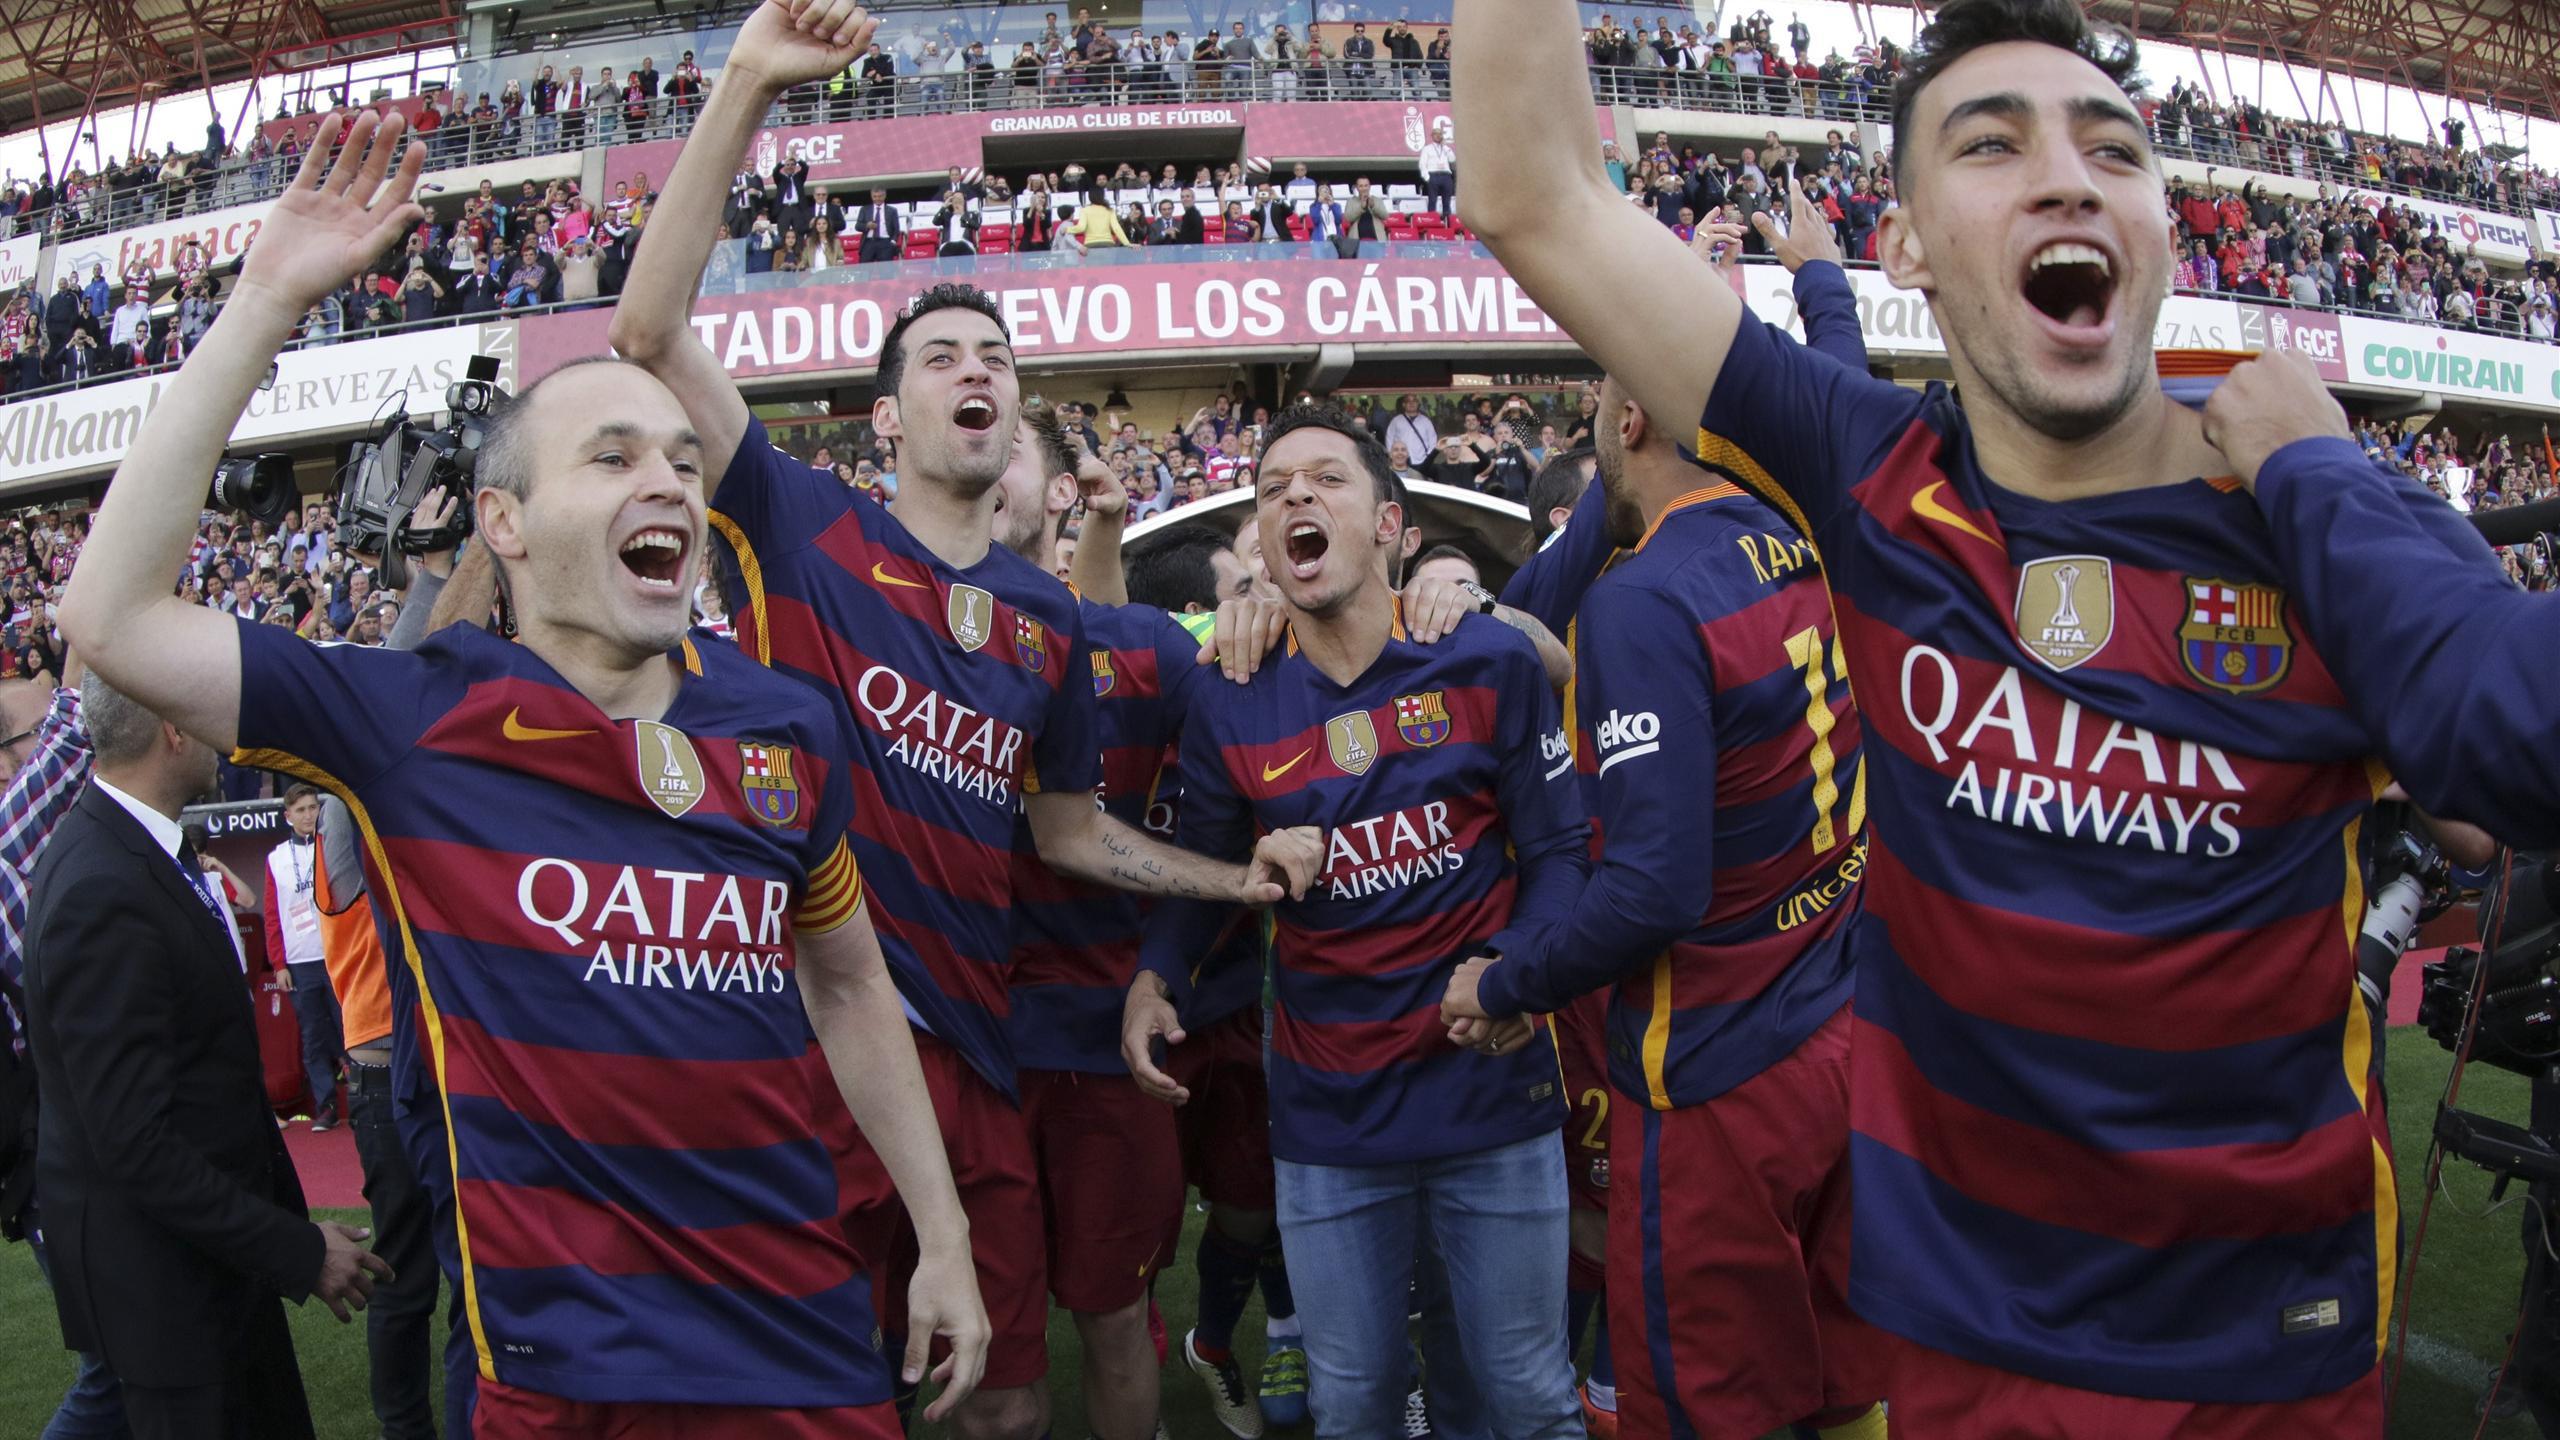 Barcelona's Andres Iniesta, Sergio Busquets, Adriano and Munir el Haddadi celebrate after winning La Liga